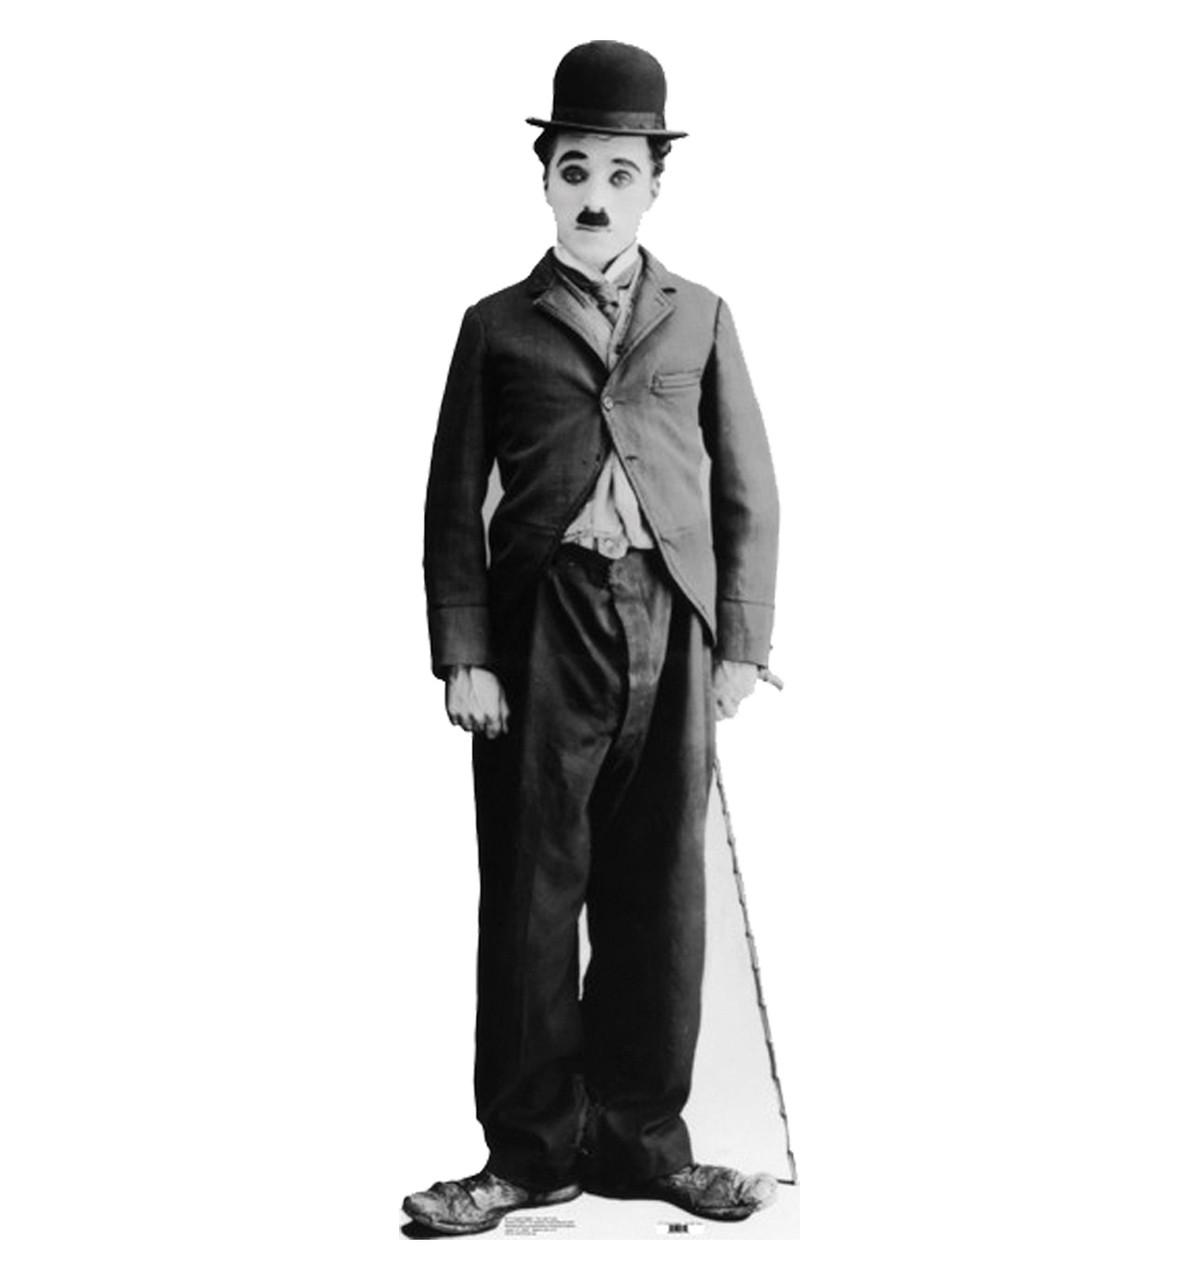 Charlie Chaplin - Little Tramp - Cardboard Cutout